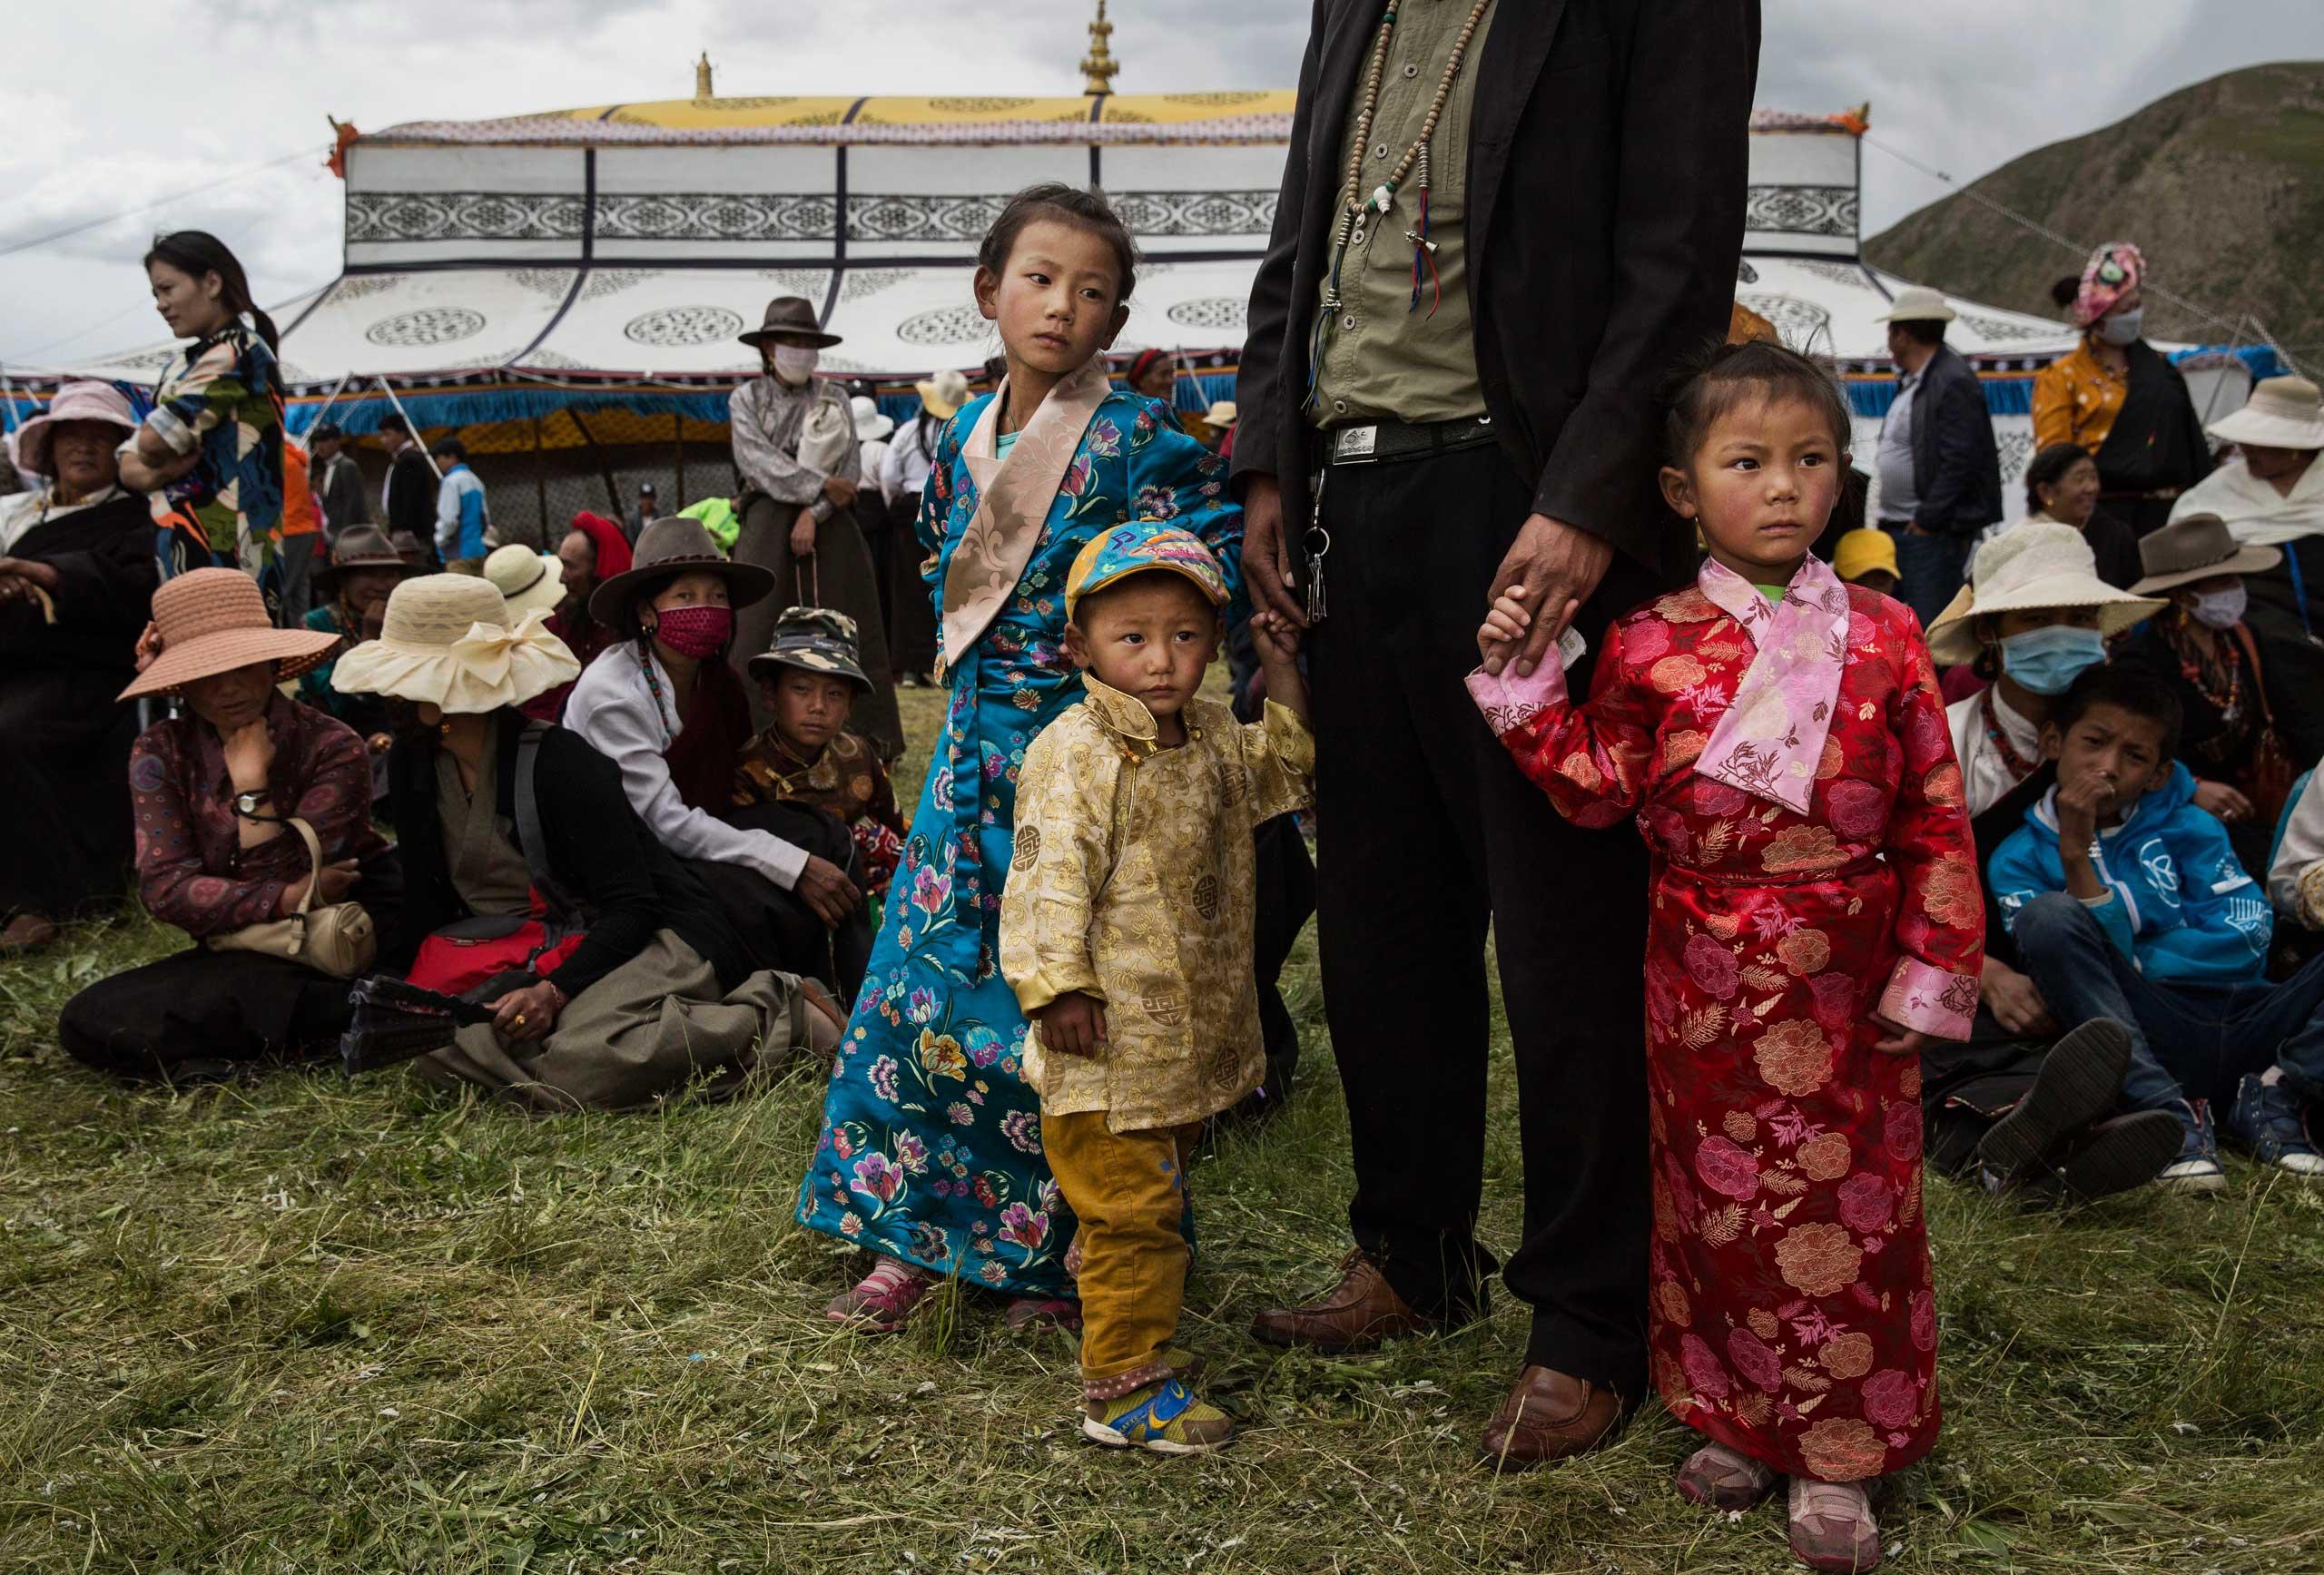 Ethnic Tibetan nomad children wear fancy dress as they watch a horse festival on the Tibetan Plateau in Yushu County,  on July 26, 2015.